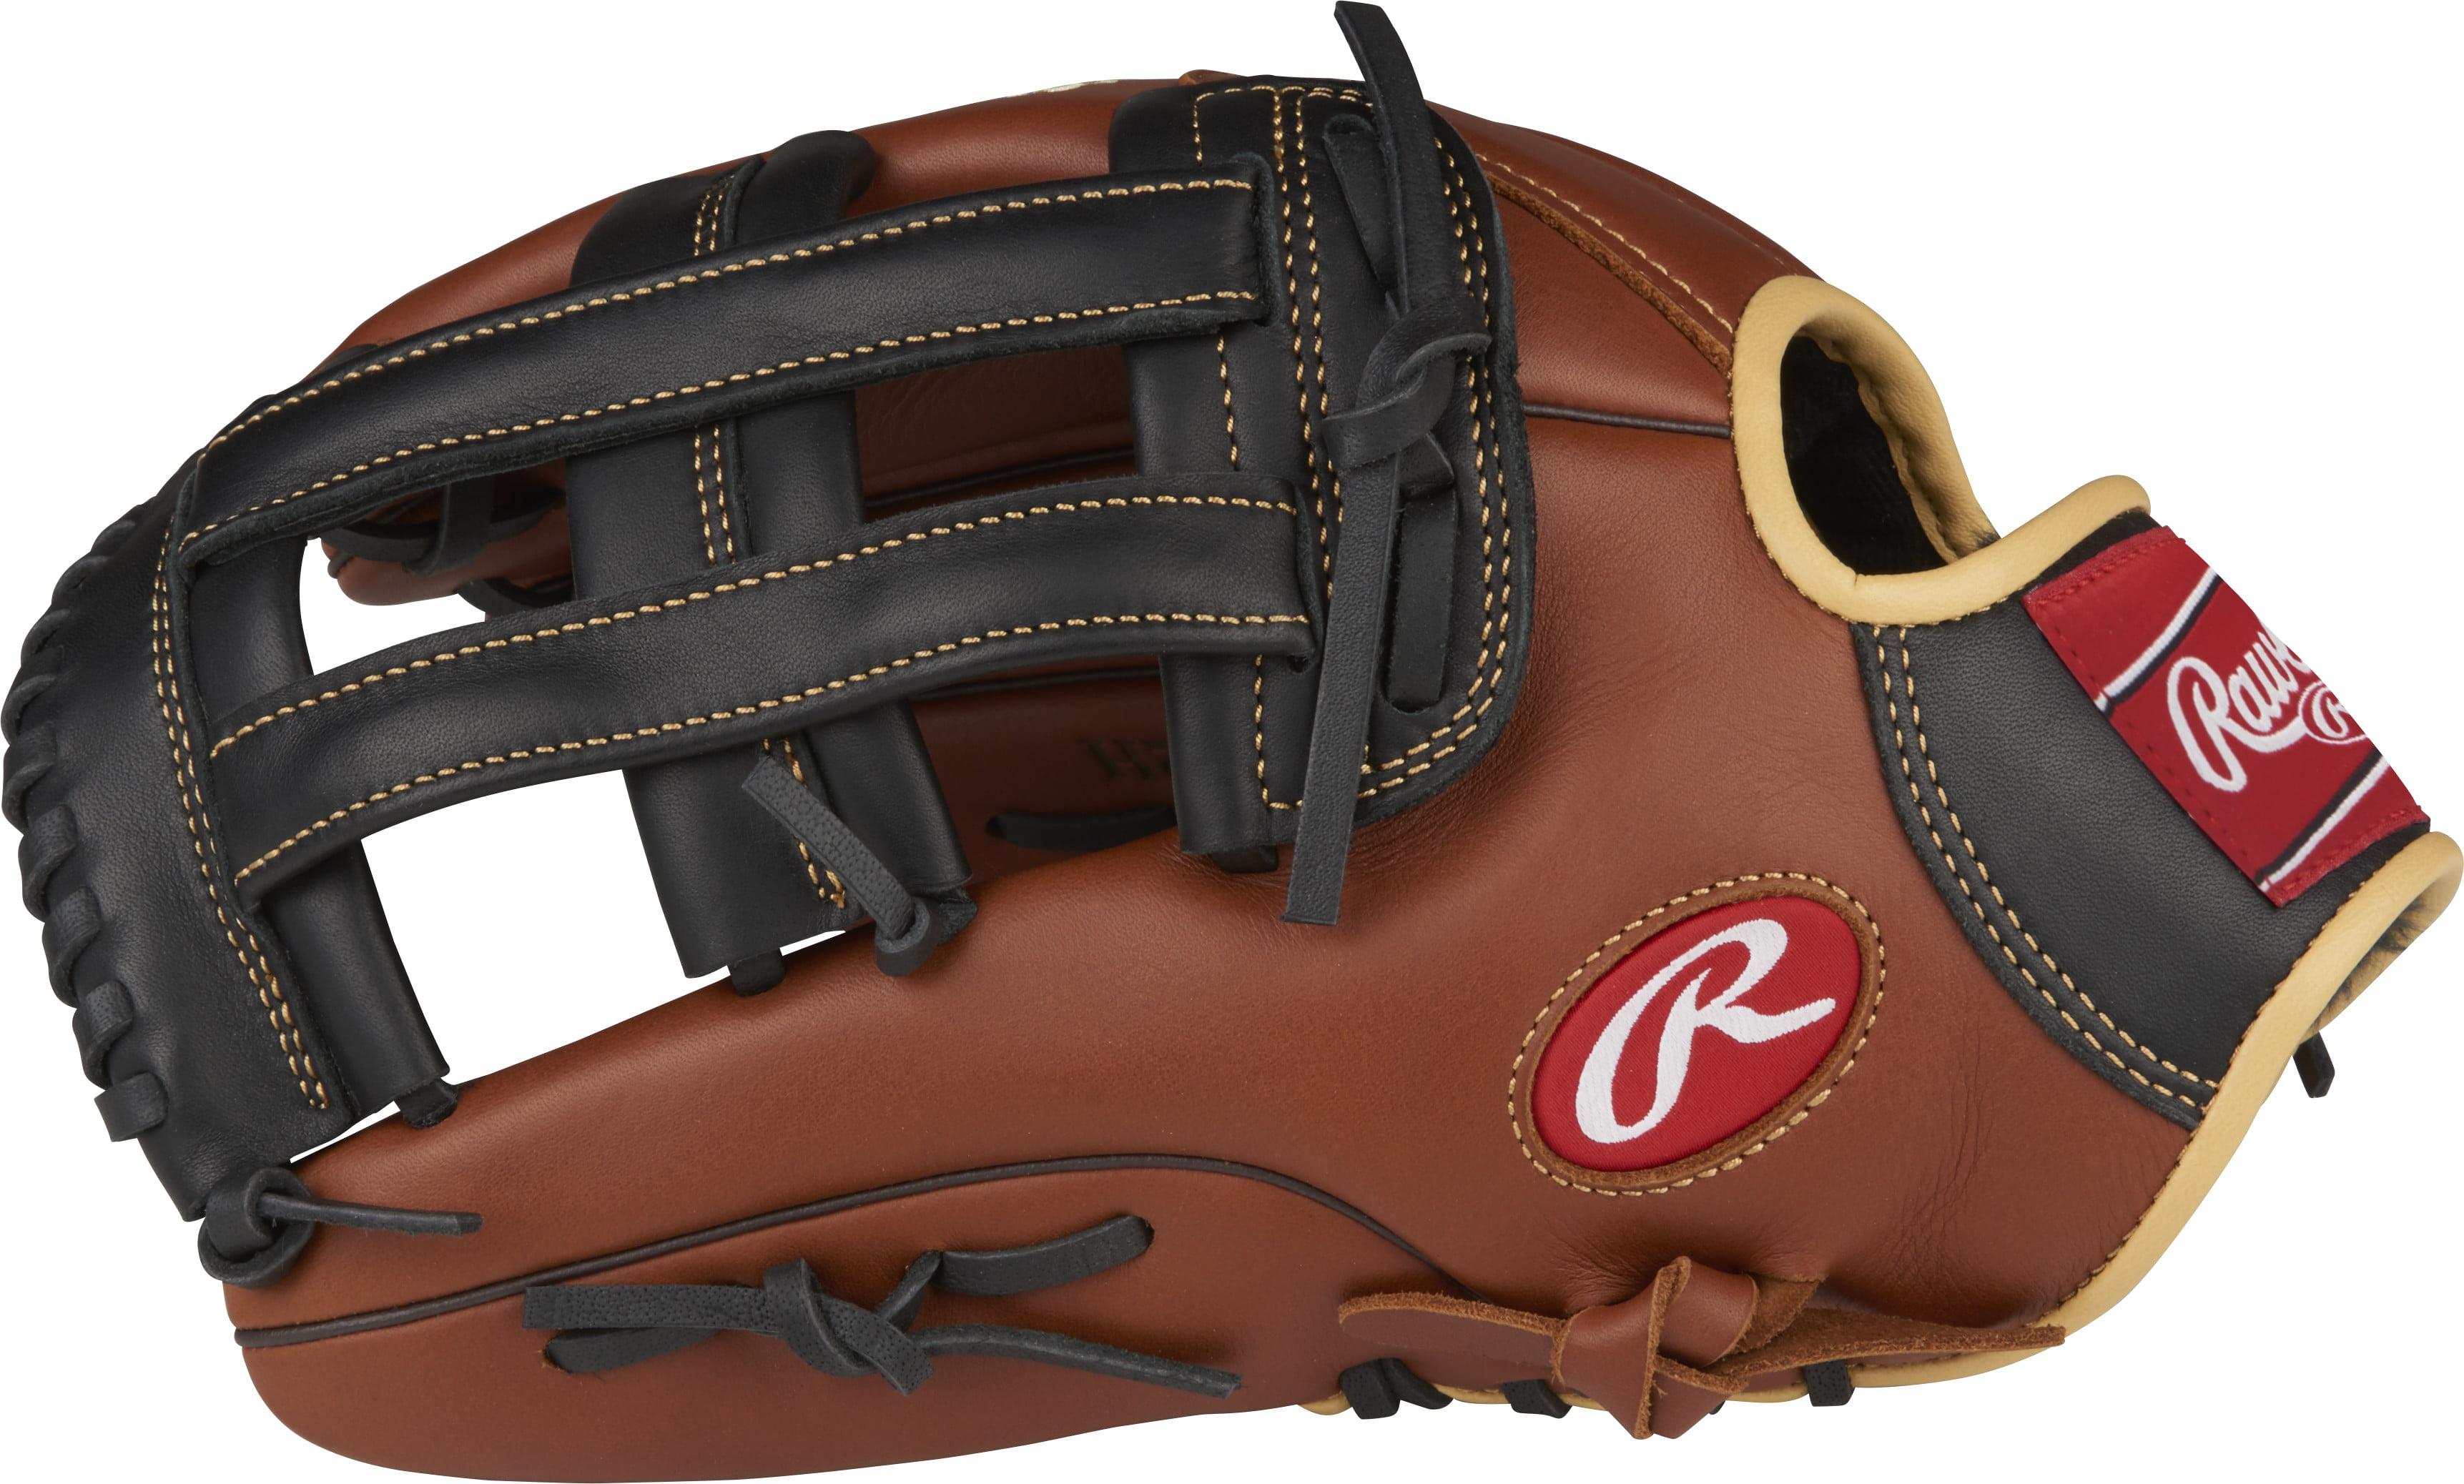 Rawlings Sandlot Series Leather Baseball Glove, Right Hand, Pro H Web, 12-3 4 Inch by Rawlings